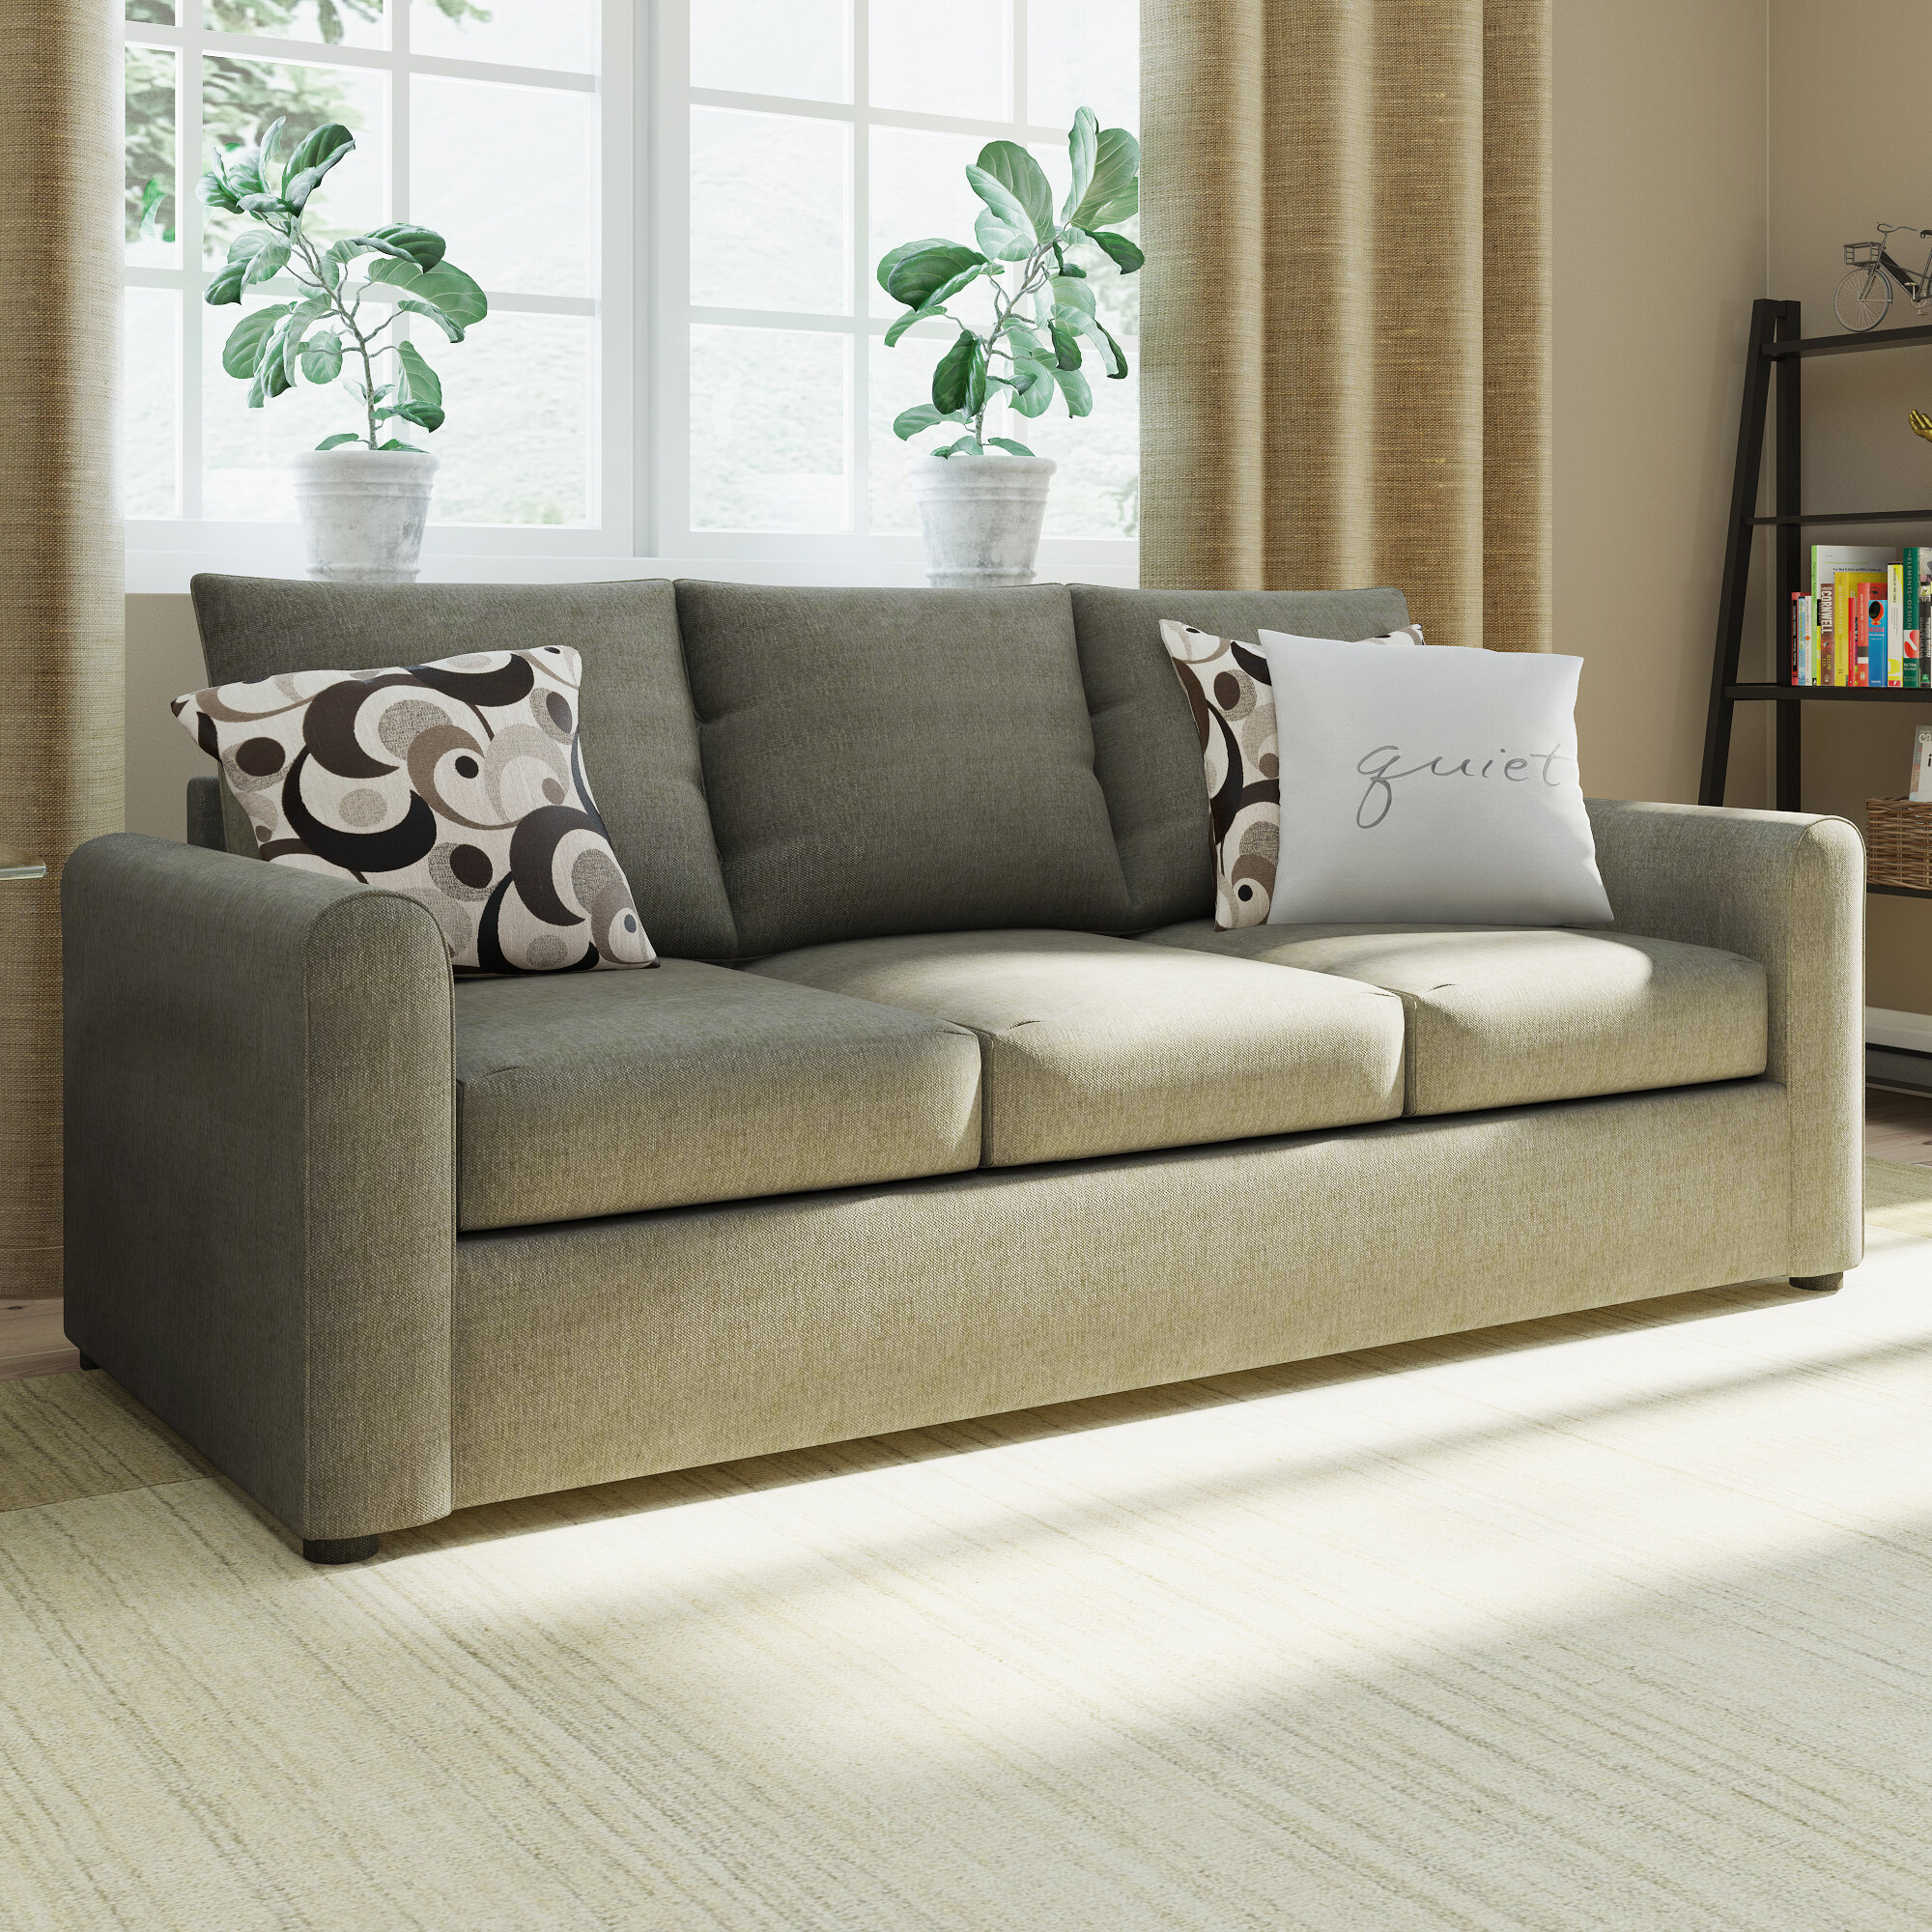 Red barrel studio serta upholstery martin house modern sleeper sofa reviews wayfair